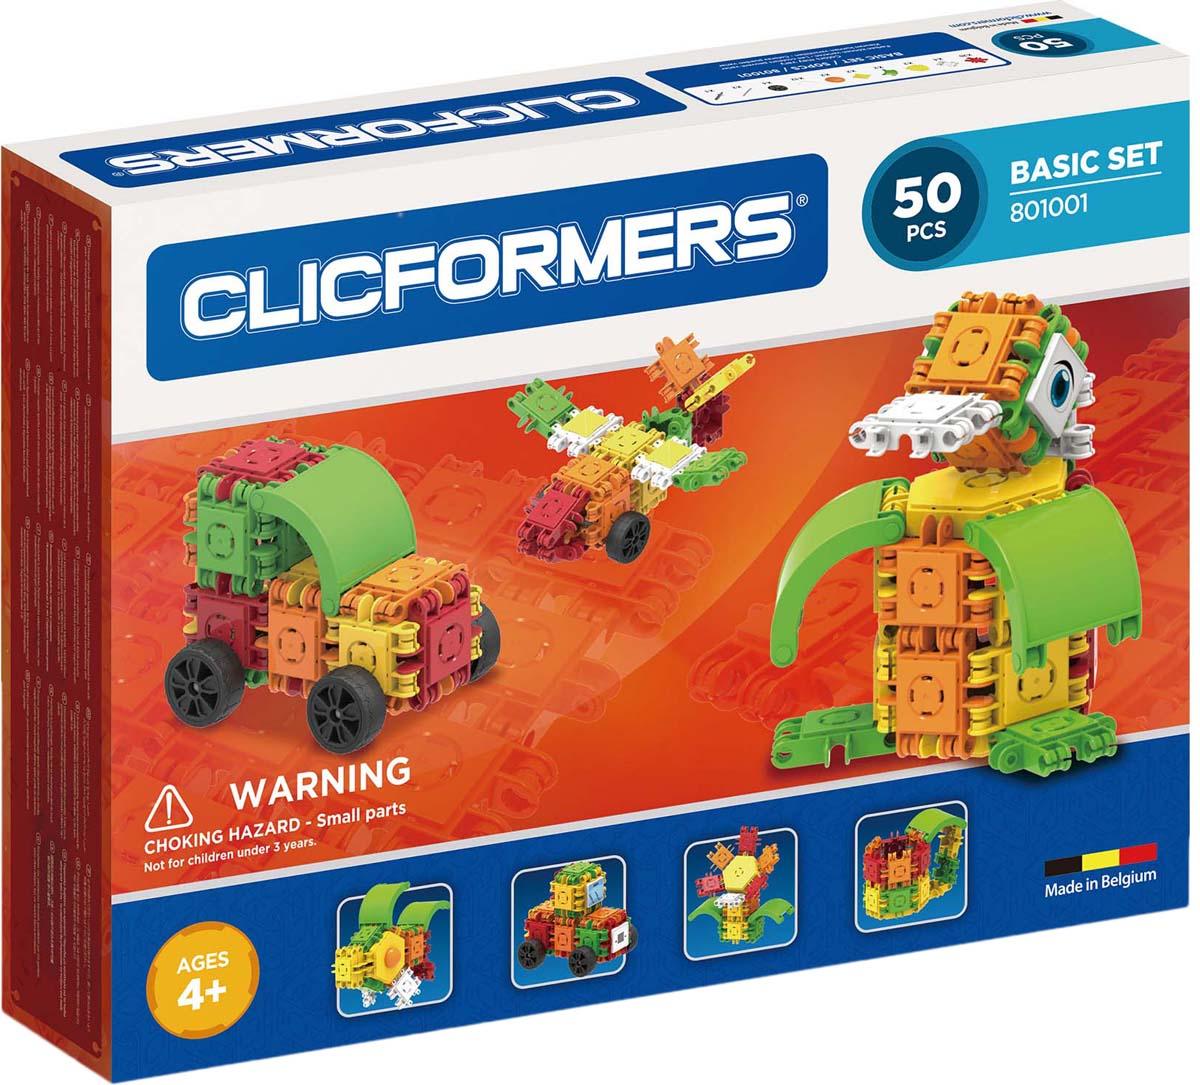 Clicformers Конструктор Basic Set 50 деталей clicformers конструктор clicformers transportation set mini 30 деталей